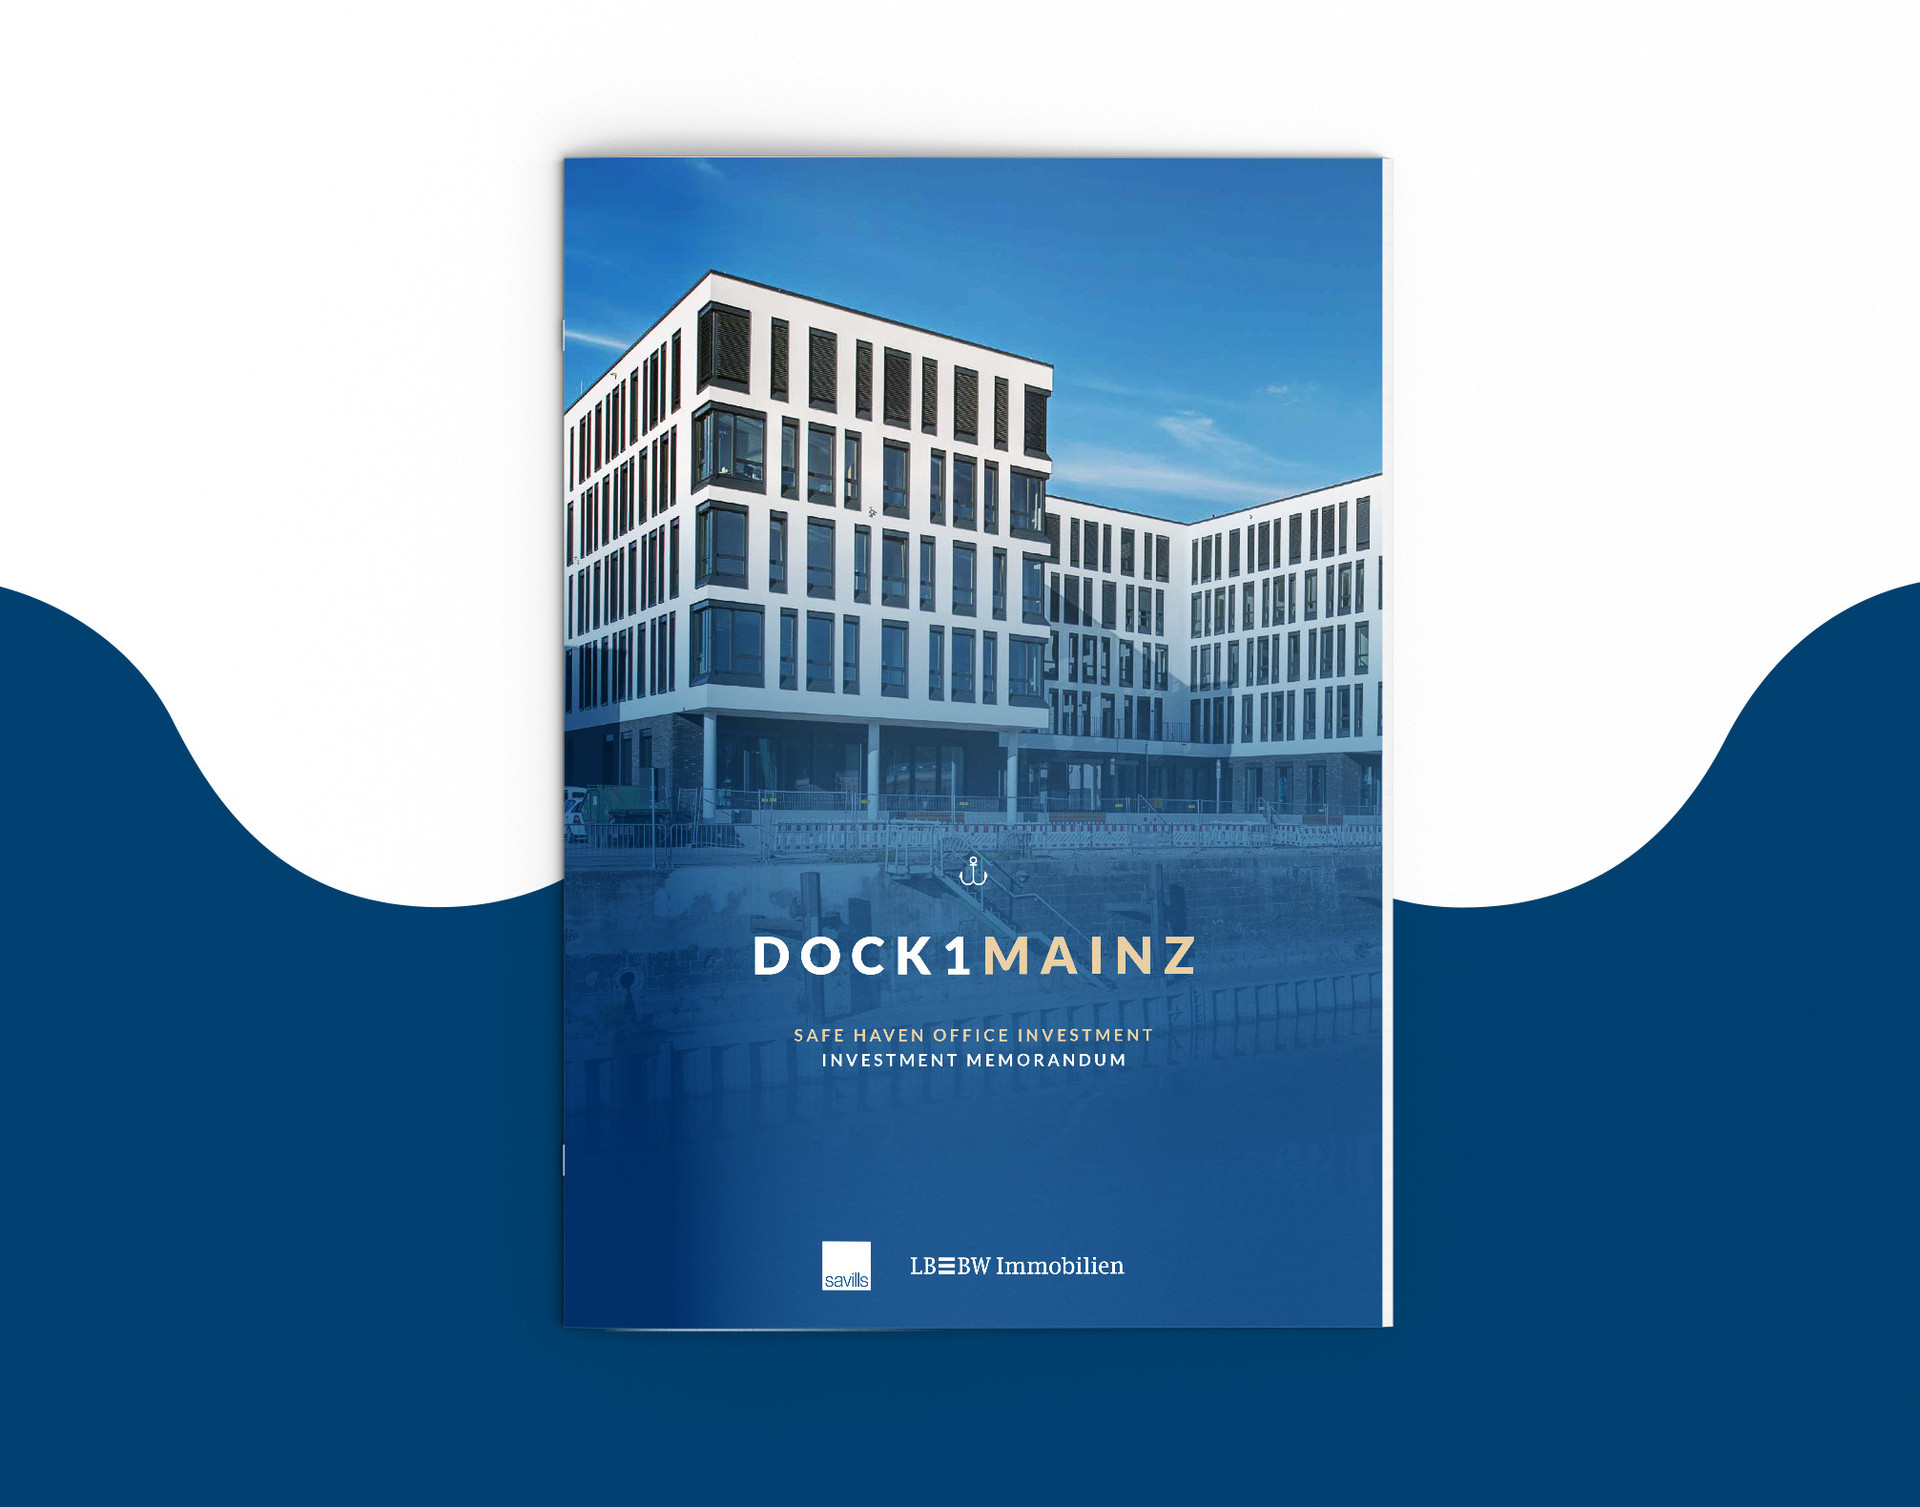 SAVILLS_DOCK1MAINZ_Mainz_Cover_Softcover